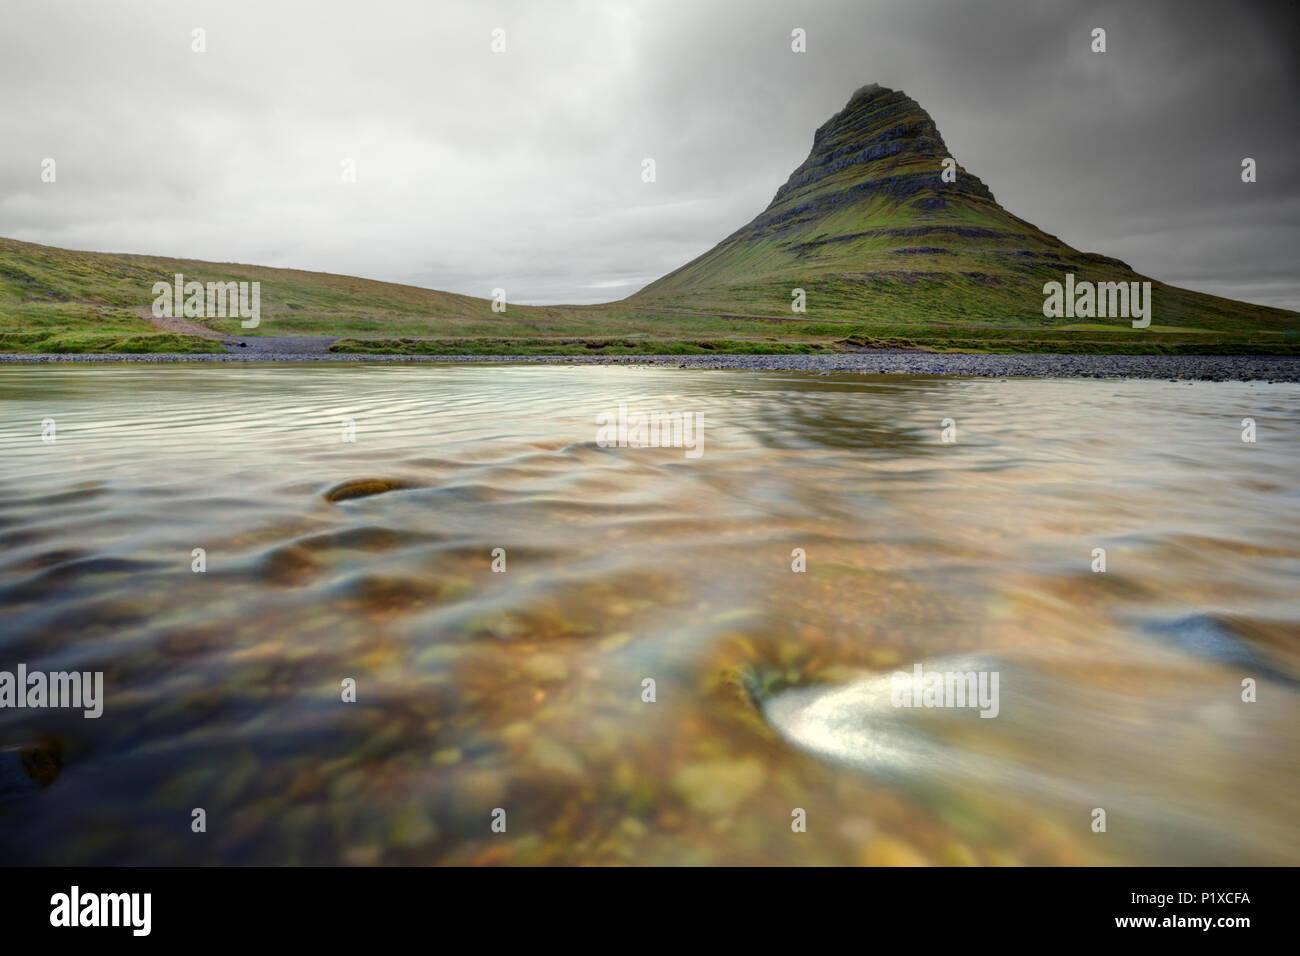 The Kirkjufellsa River flows below Kirkjufell (Church Mountain), Grundarfjordur, Snaefellsnes peninsula, West Iceland, Iceland - Stock Image